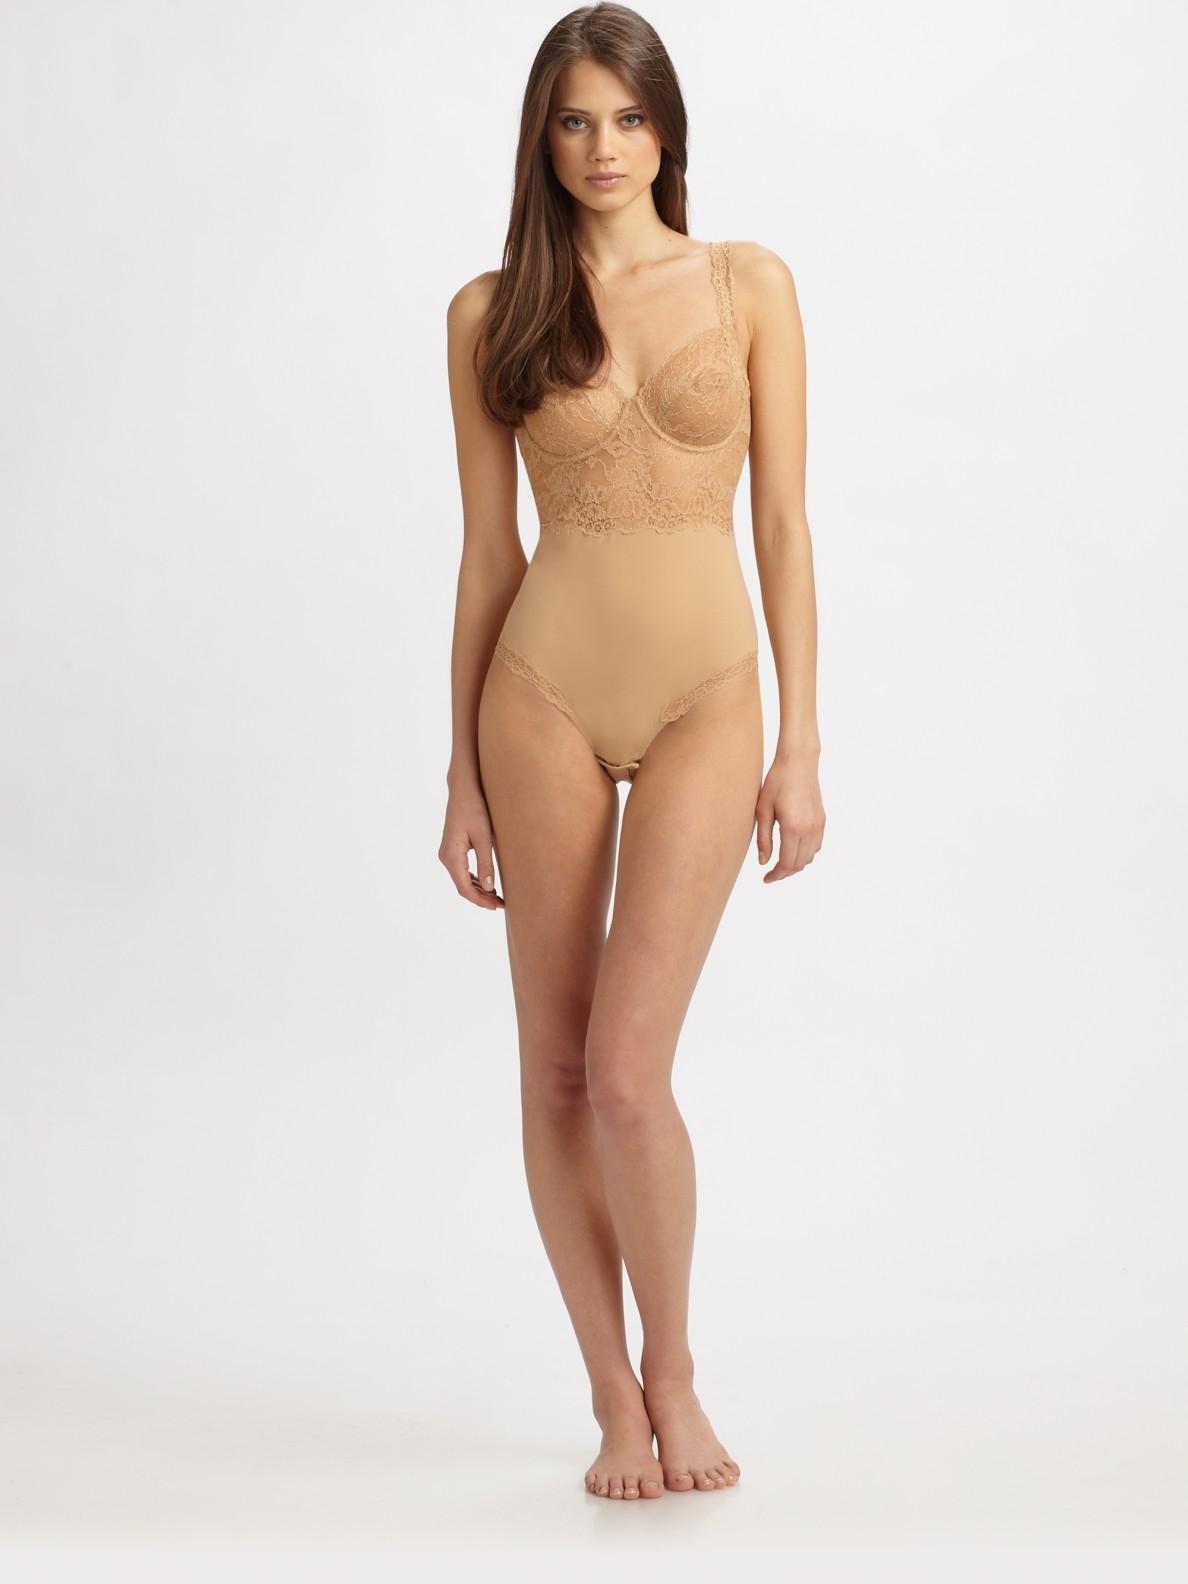 New Jacqueline Fernandez Nude Hq Archives Wallpaper